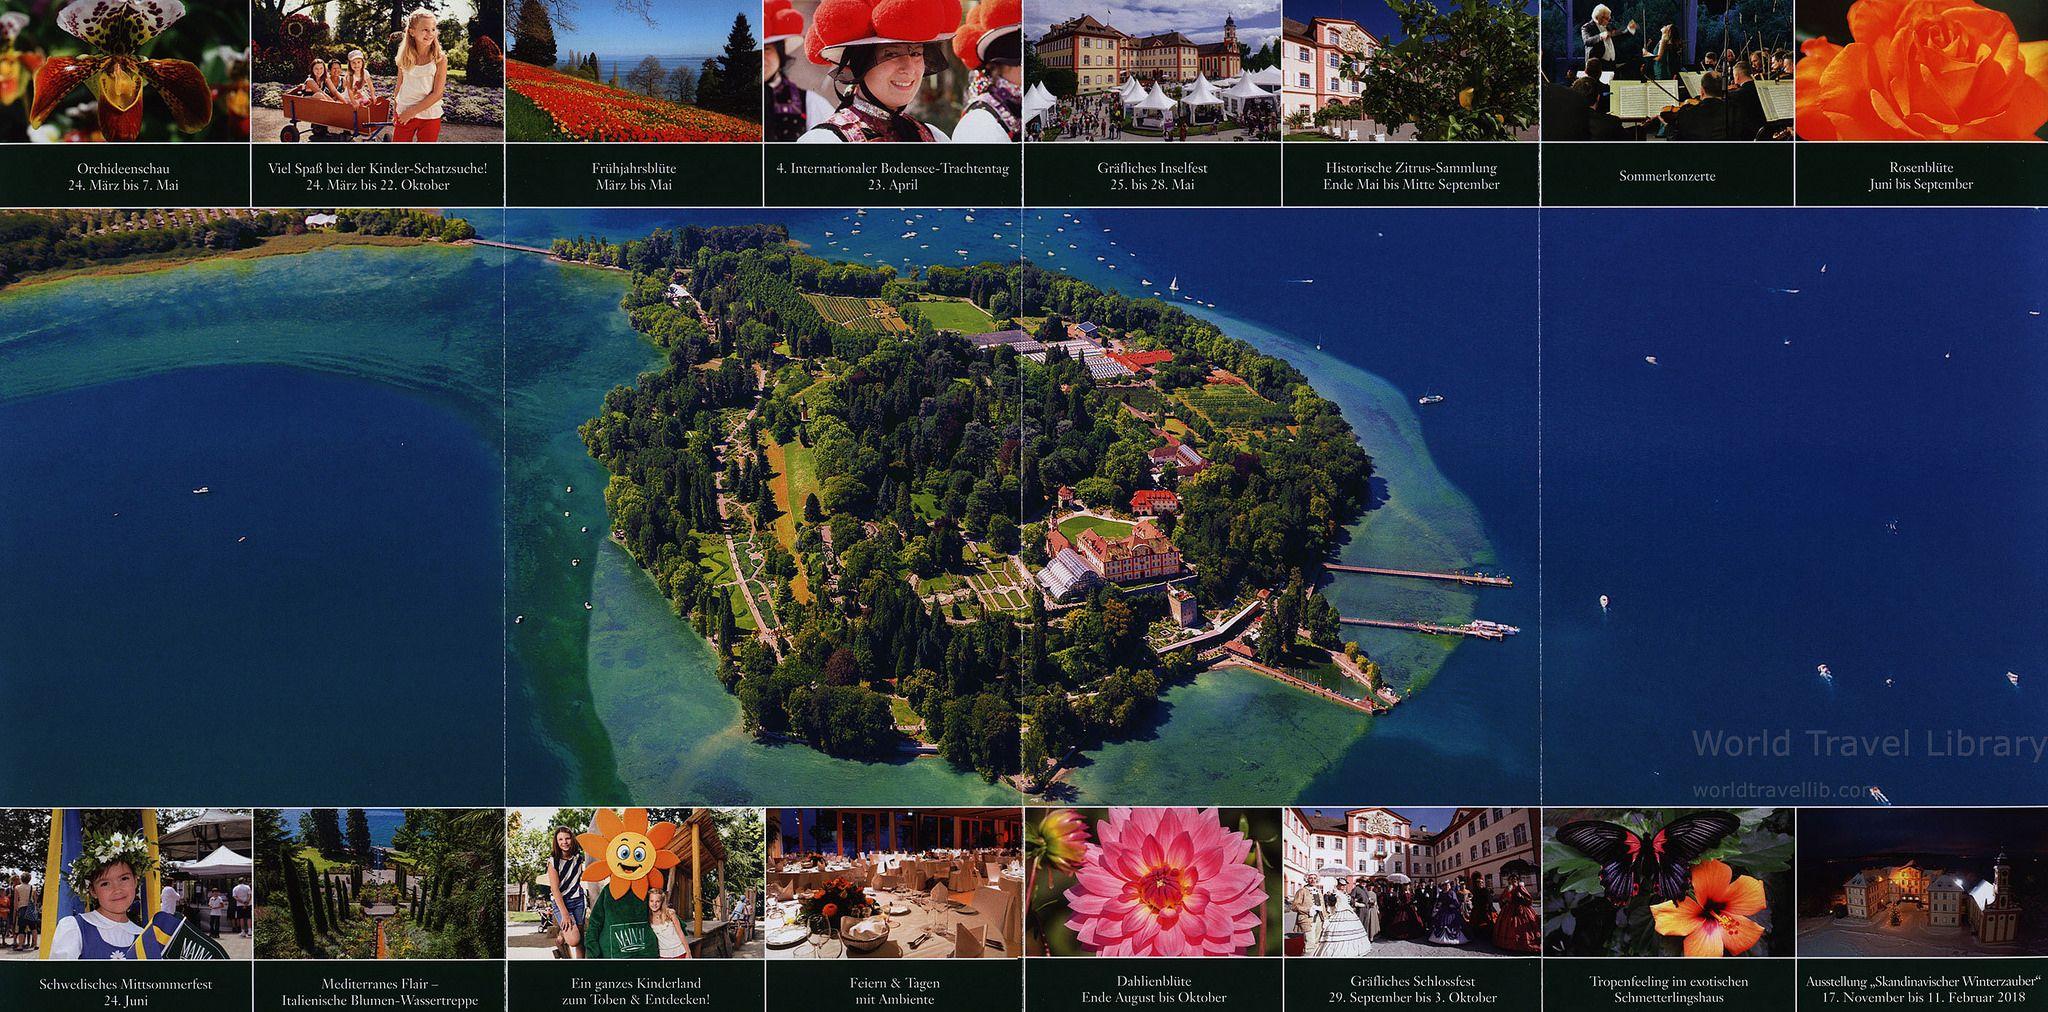 Insel Mainau Zahlenspiel Und Farbenplus Auf Der Insel Mainau 2017 2 Bodensee Baden Wurttemberg Germany Wonders Of The World Travel Inspiration Beautiful Nature